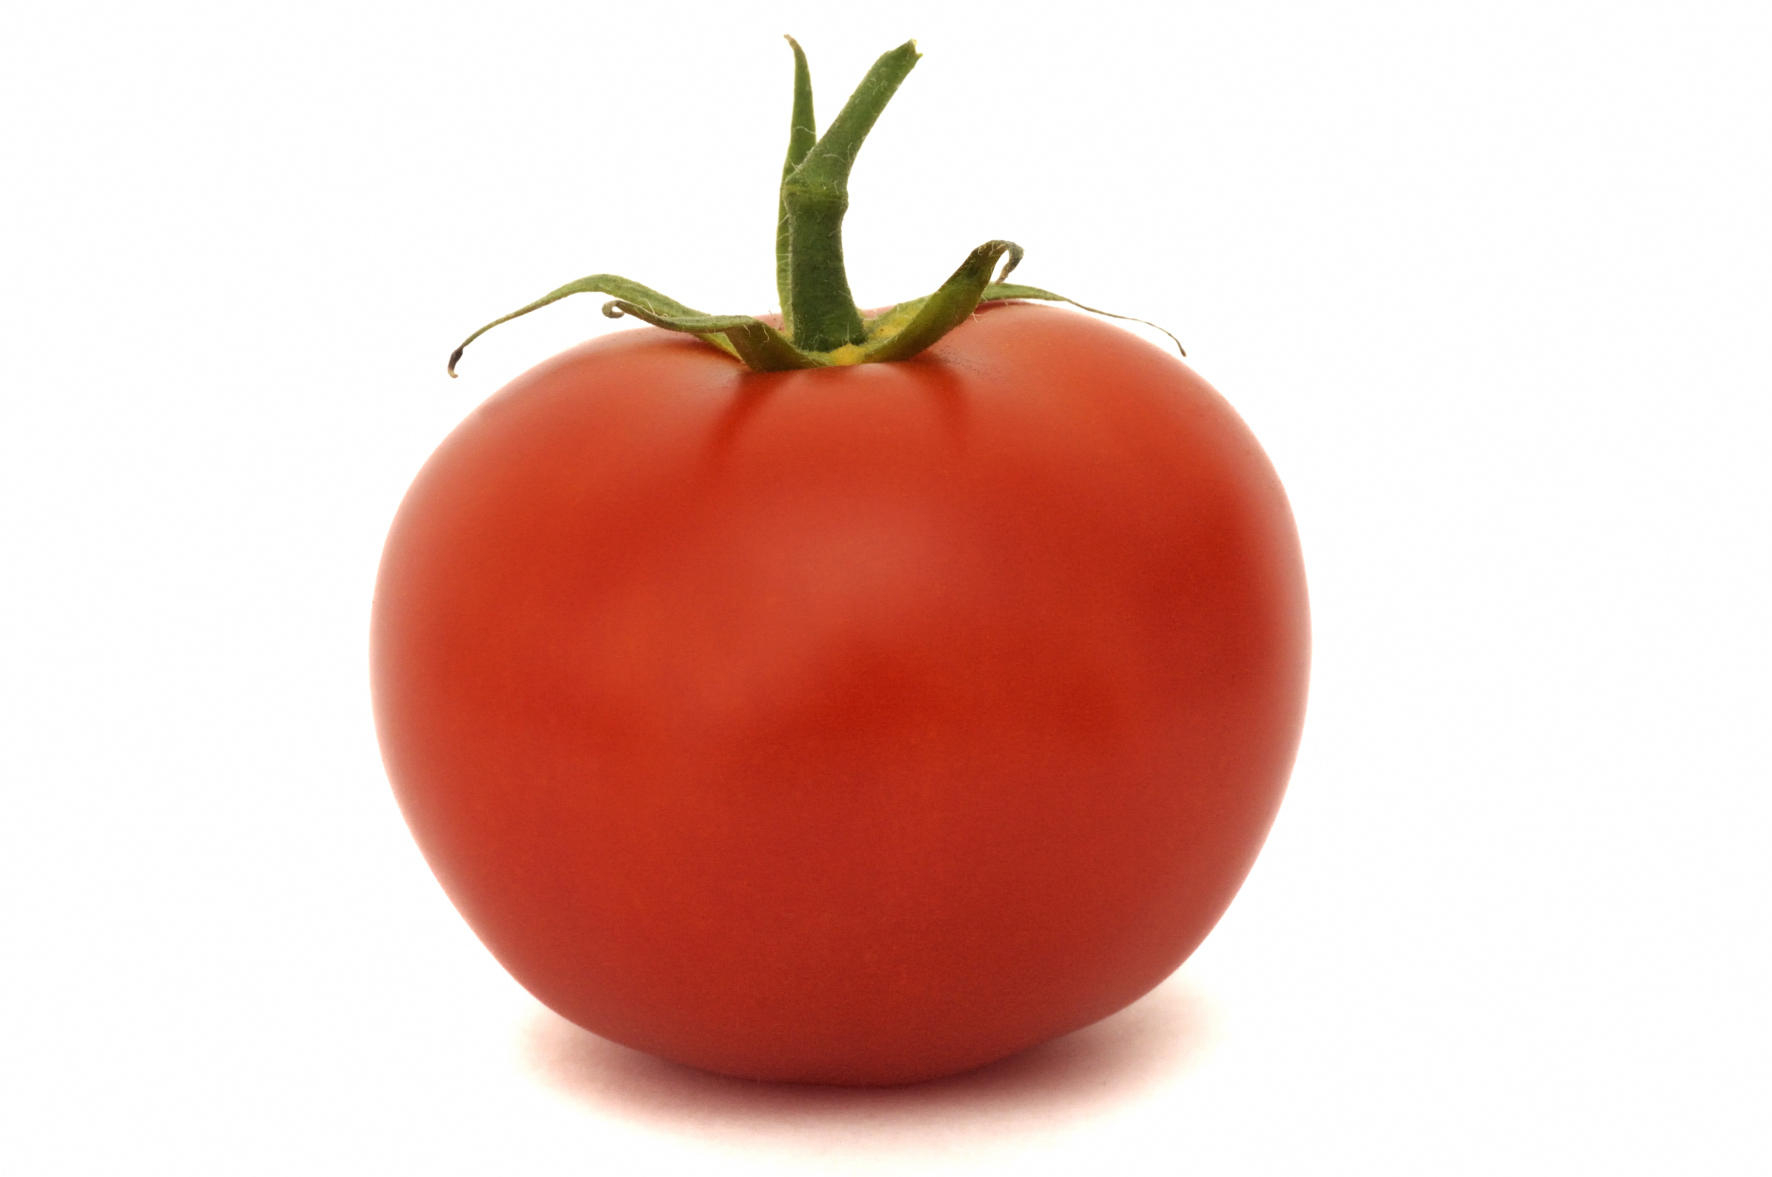 Tomato #7 | Fruit | Food | Food | All image | Niffylux ...